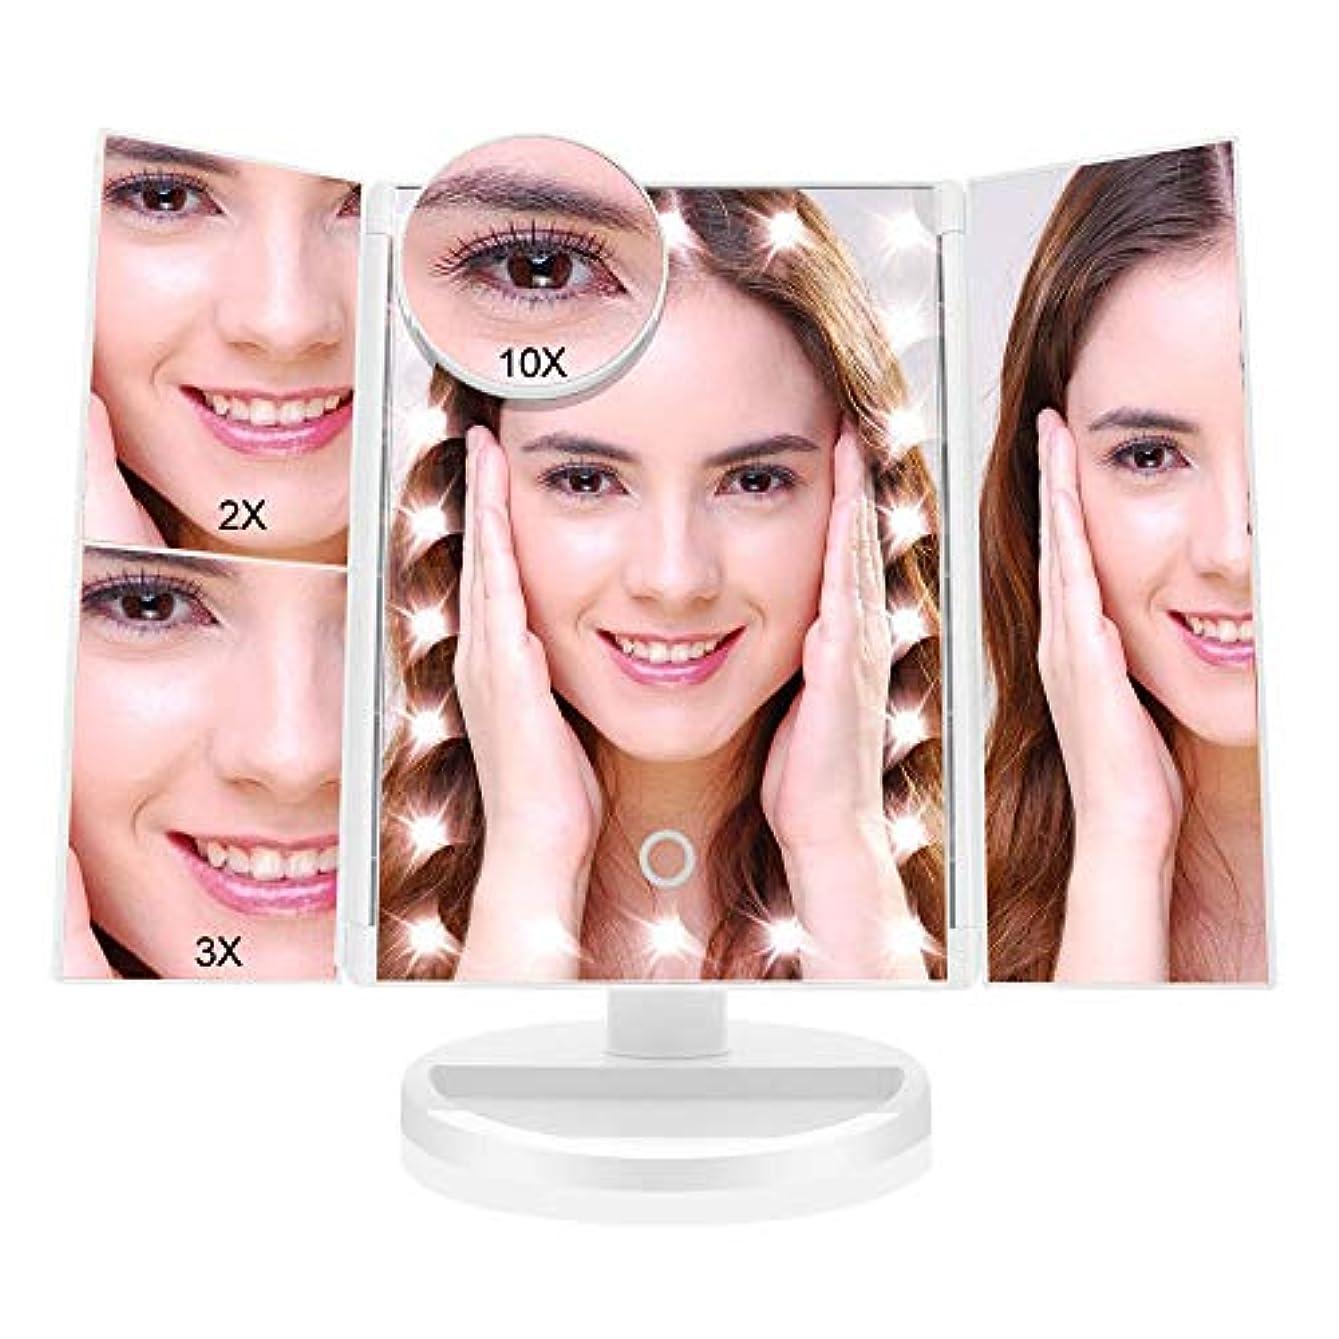 属性ペニー来て化粧鏡 化粧ミラー 鏡 三面鏡 女優 卓上 21個LED付き 拡大鏡 2X 3X 10X 倍 明るさ調節可能 180°回転 電池&USB2WAY給電 収納便利